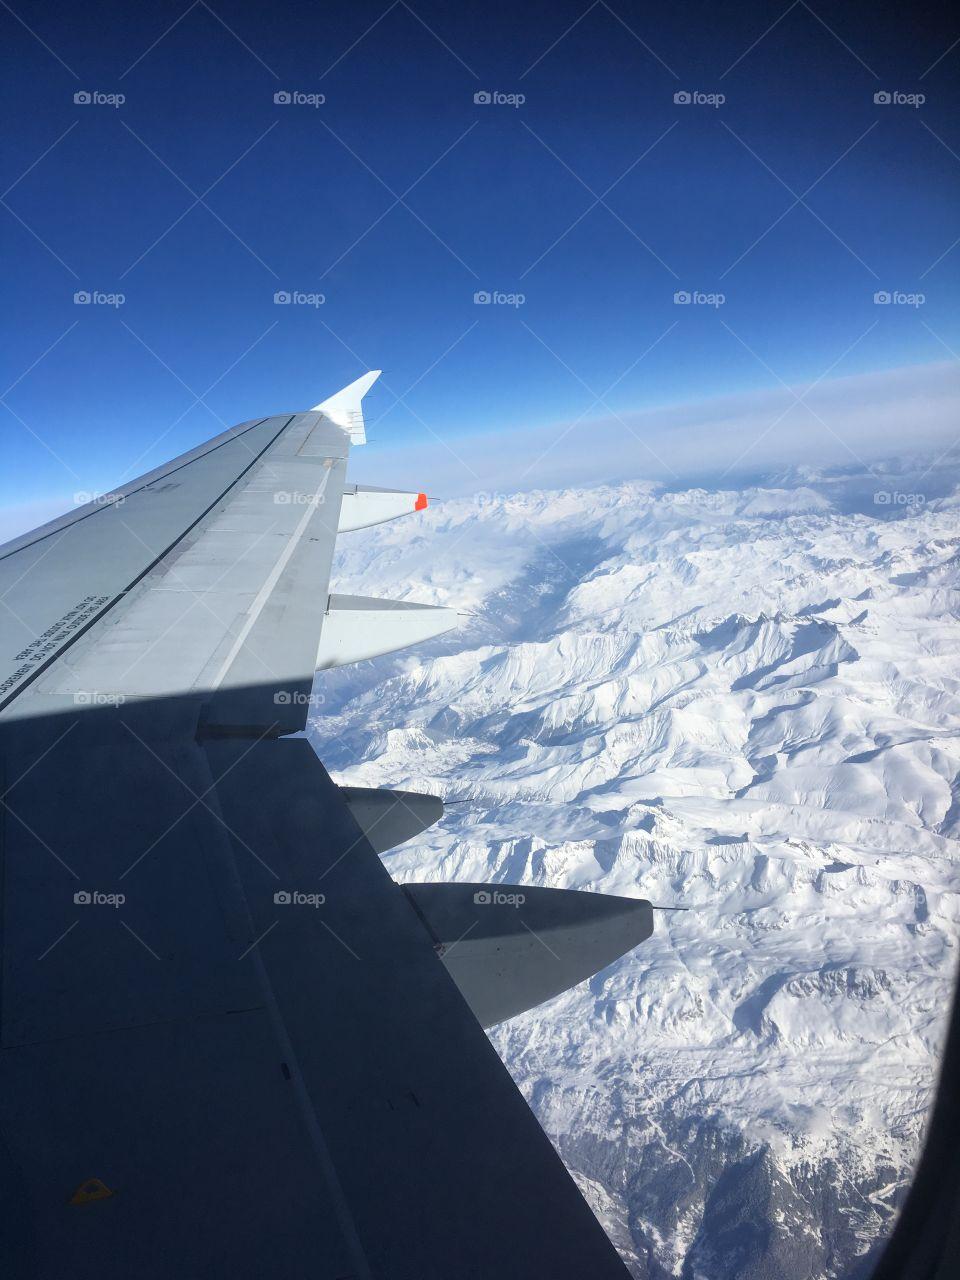 Les montagnes vues du ciel